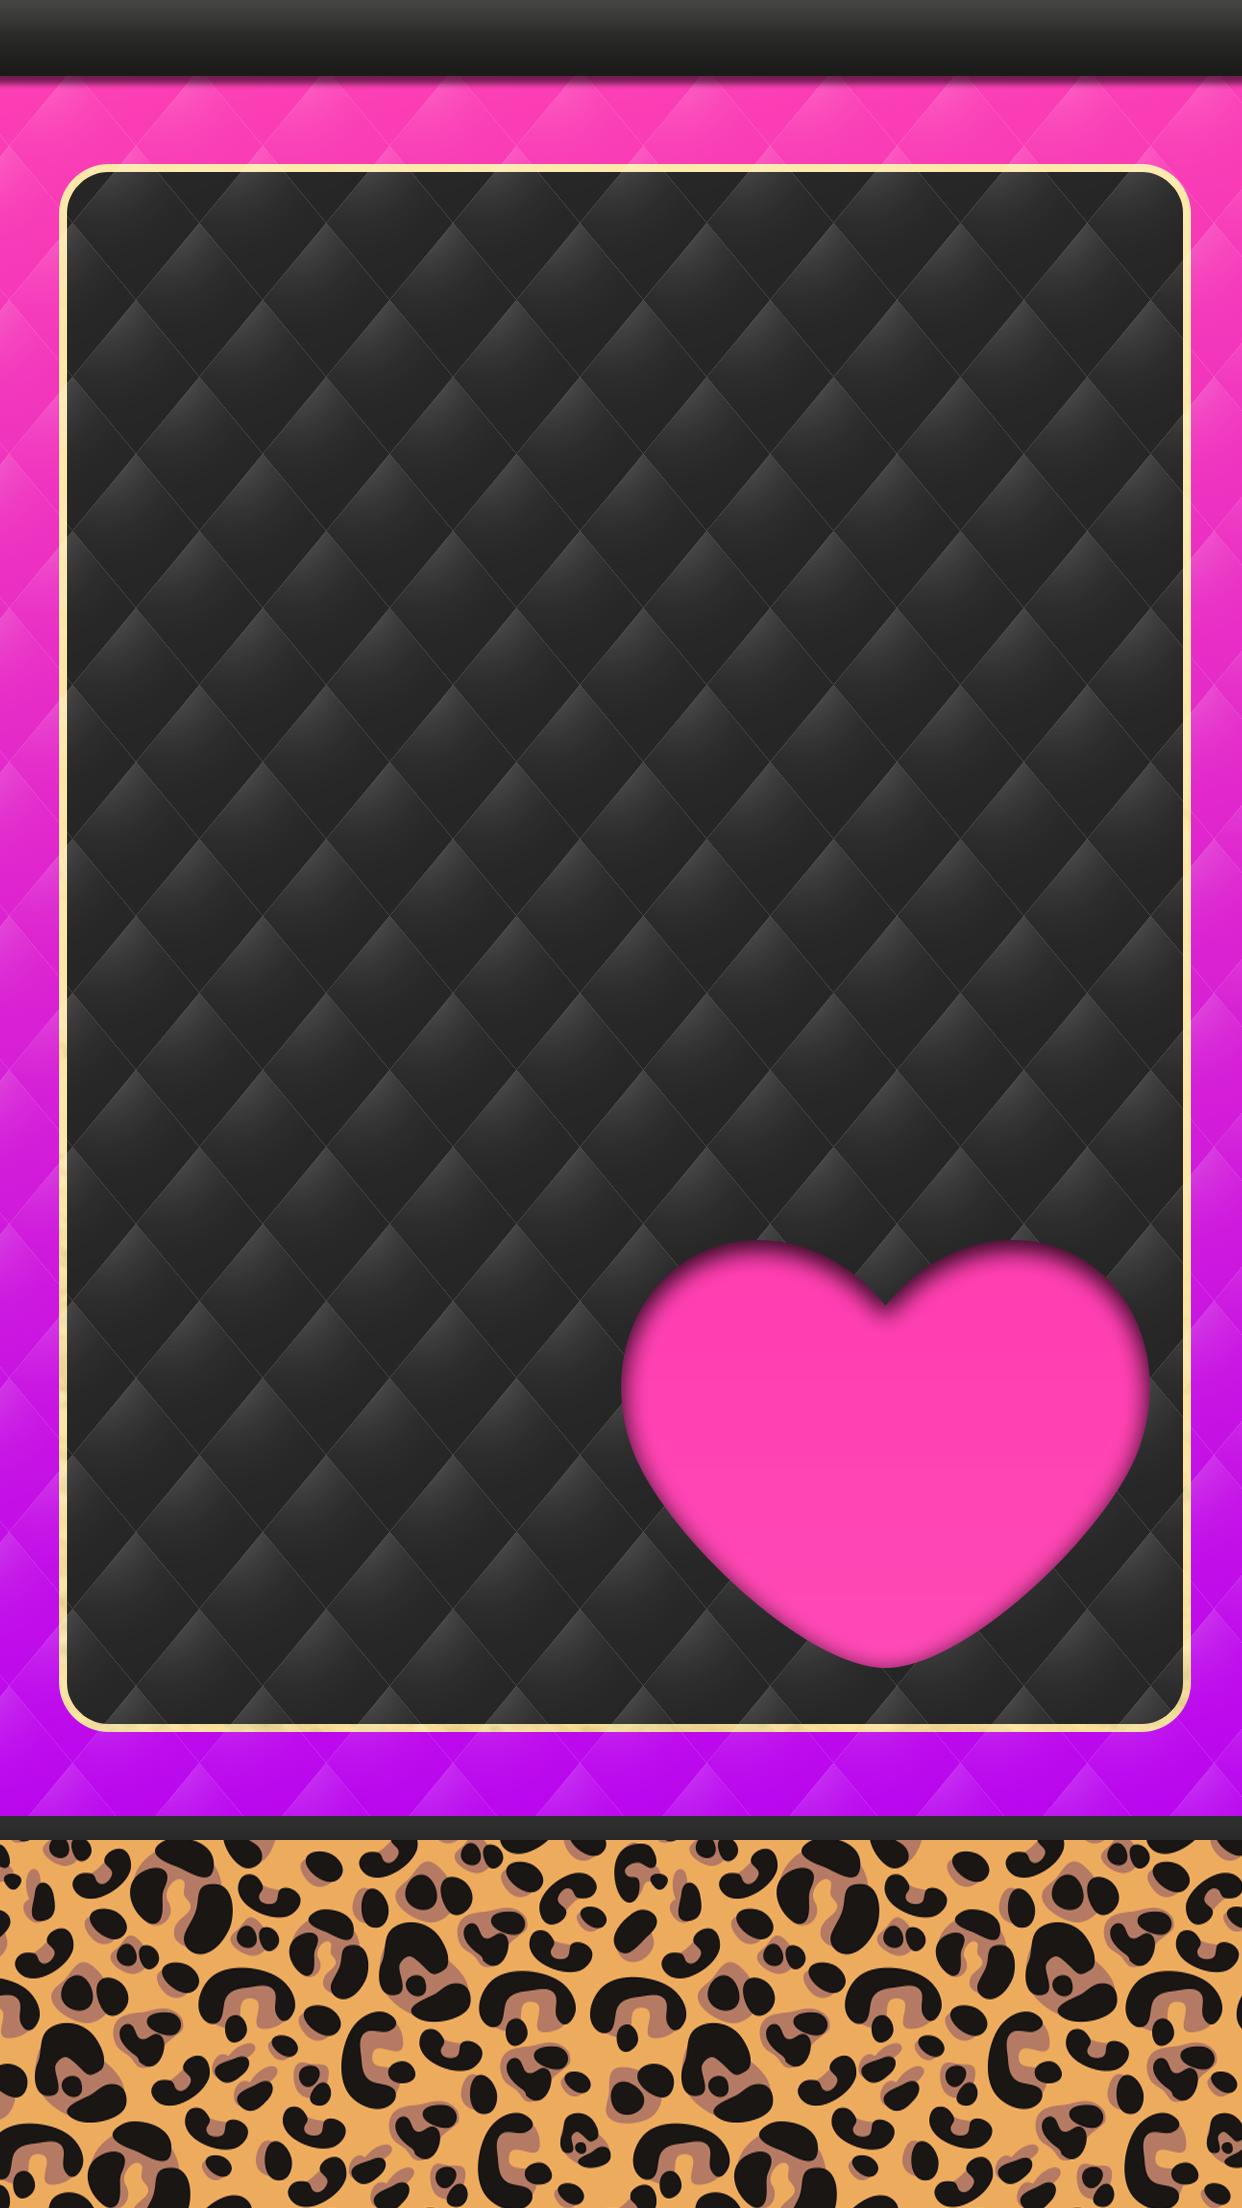 Iphone Wall Tjn Glitter Wallpaper Heart Wallpapero Kitty Wallpaper I Wallpaper